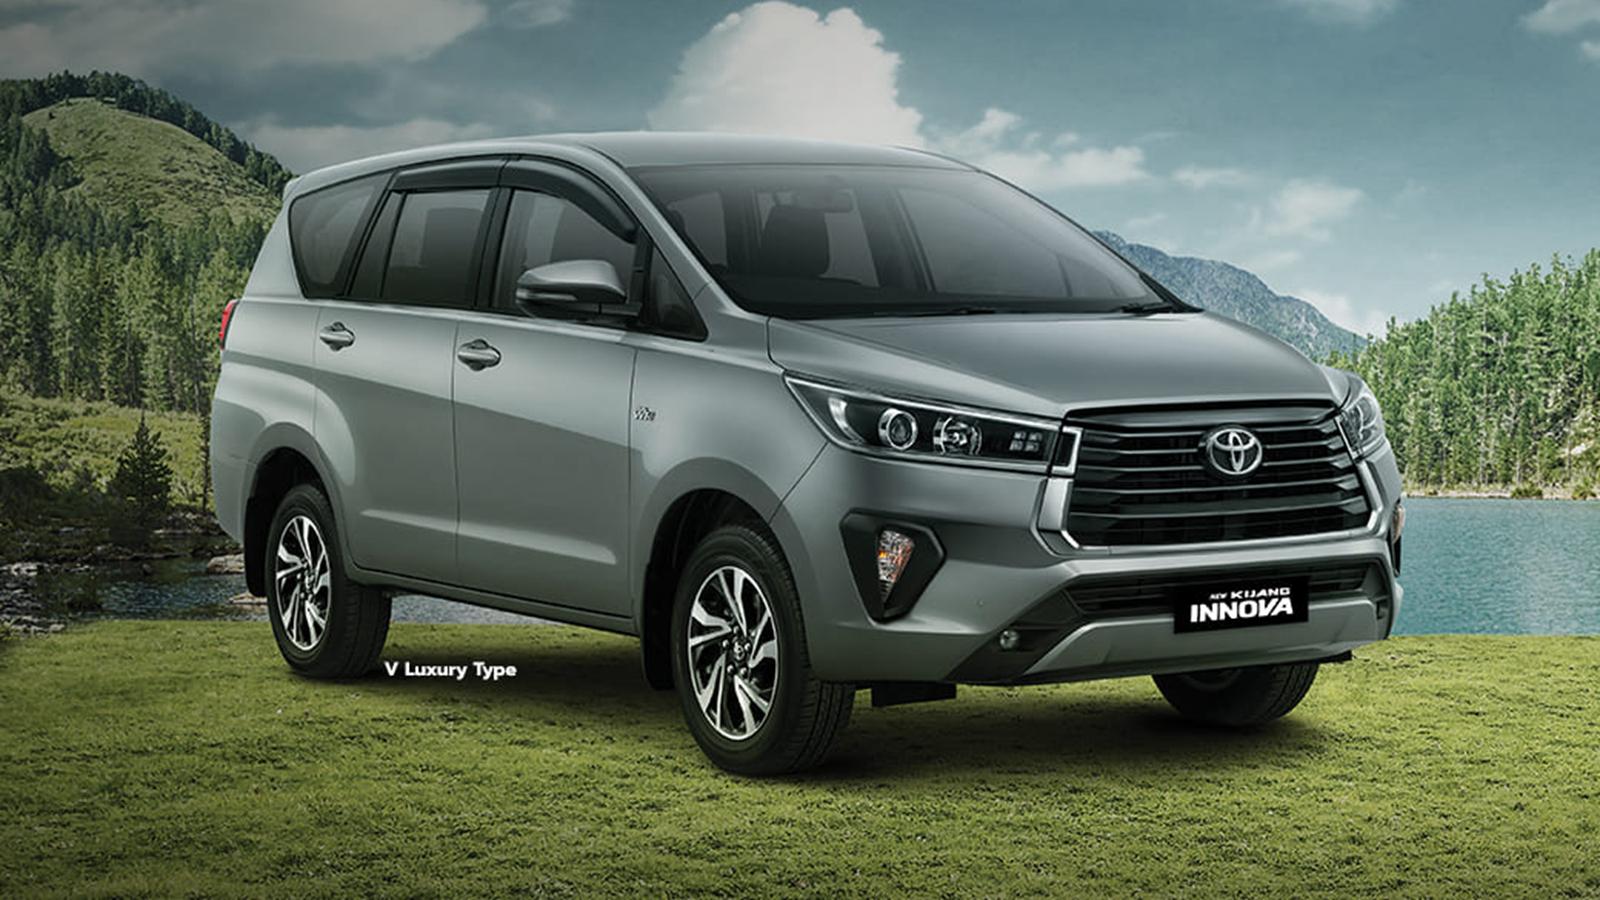 Kelebihan Harga Toyota Innova 2019 Tangguh